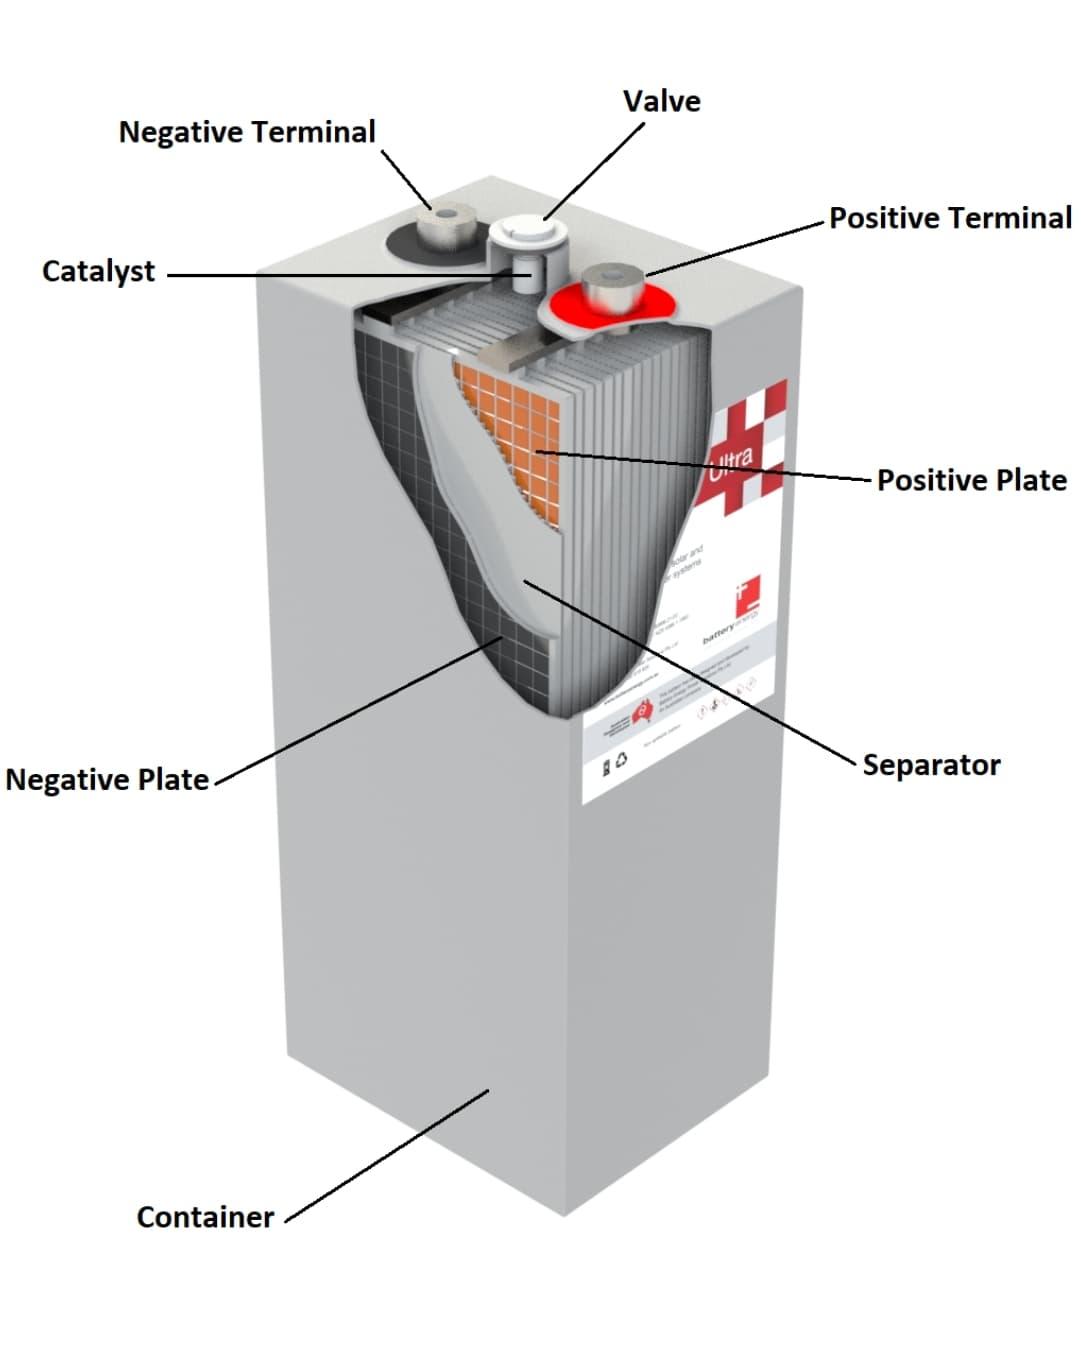 Product cutaway